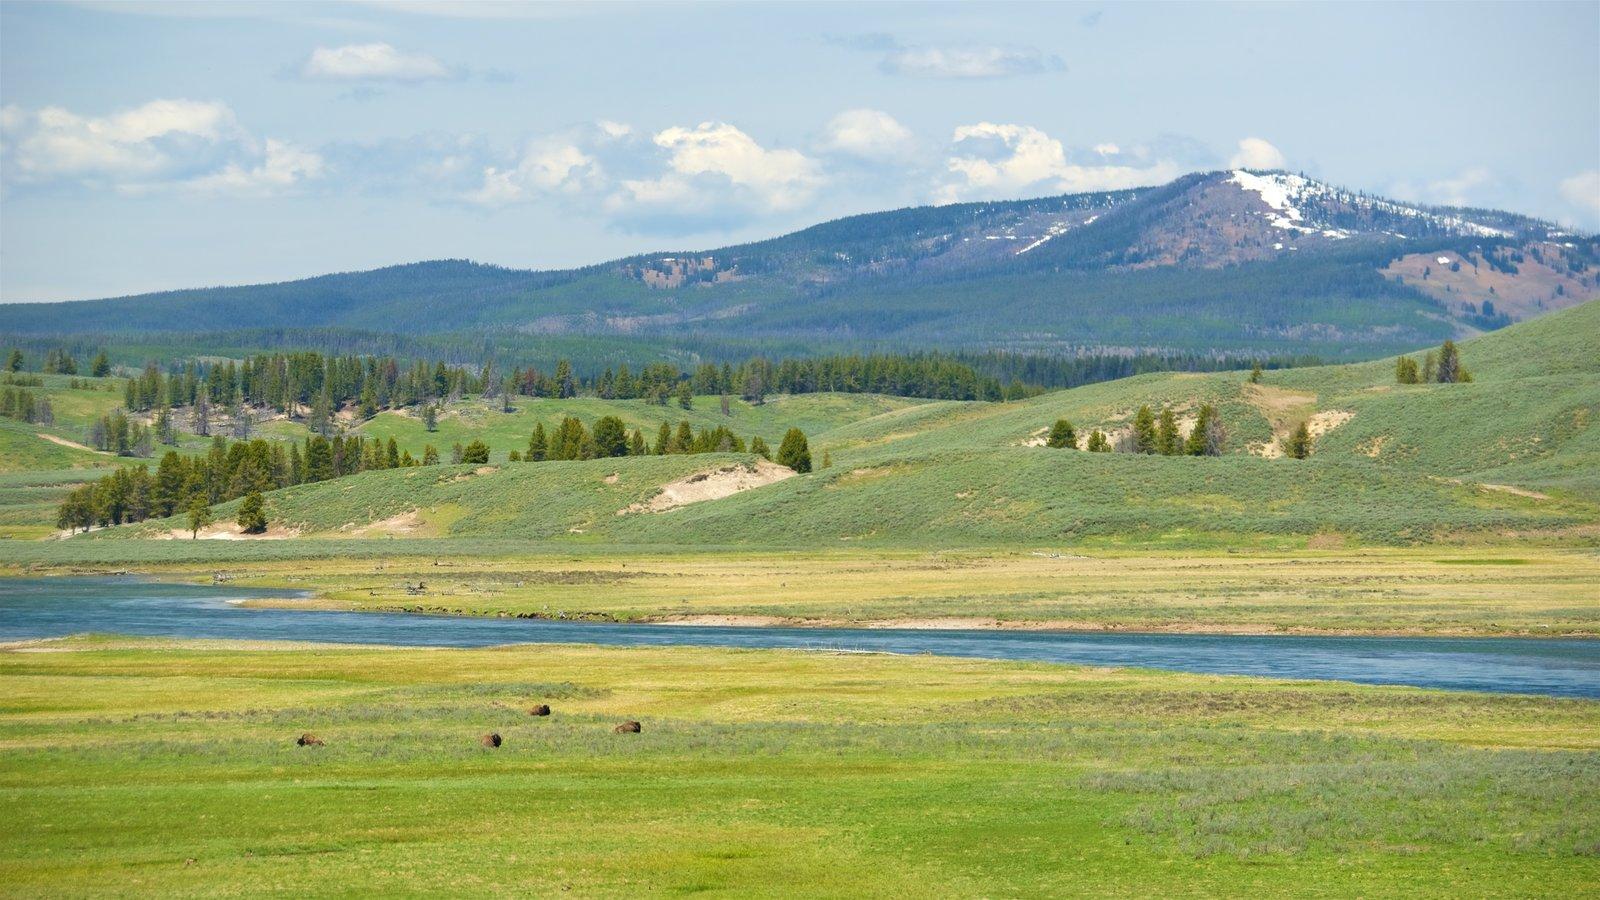 Hayden Valley que inclui animais terrestres, um rio ou córrego e cenas tranquilas